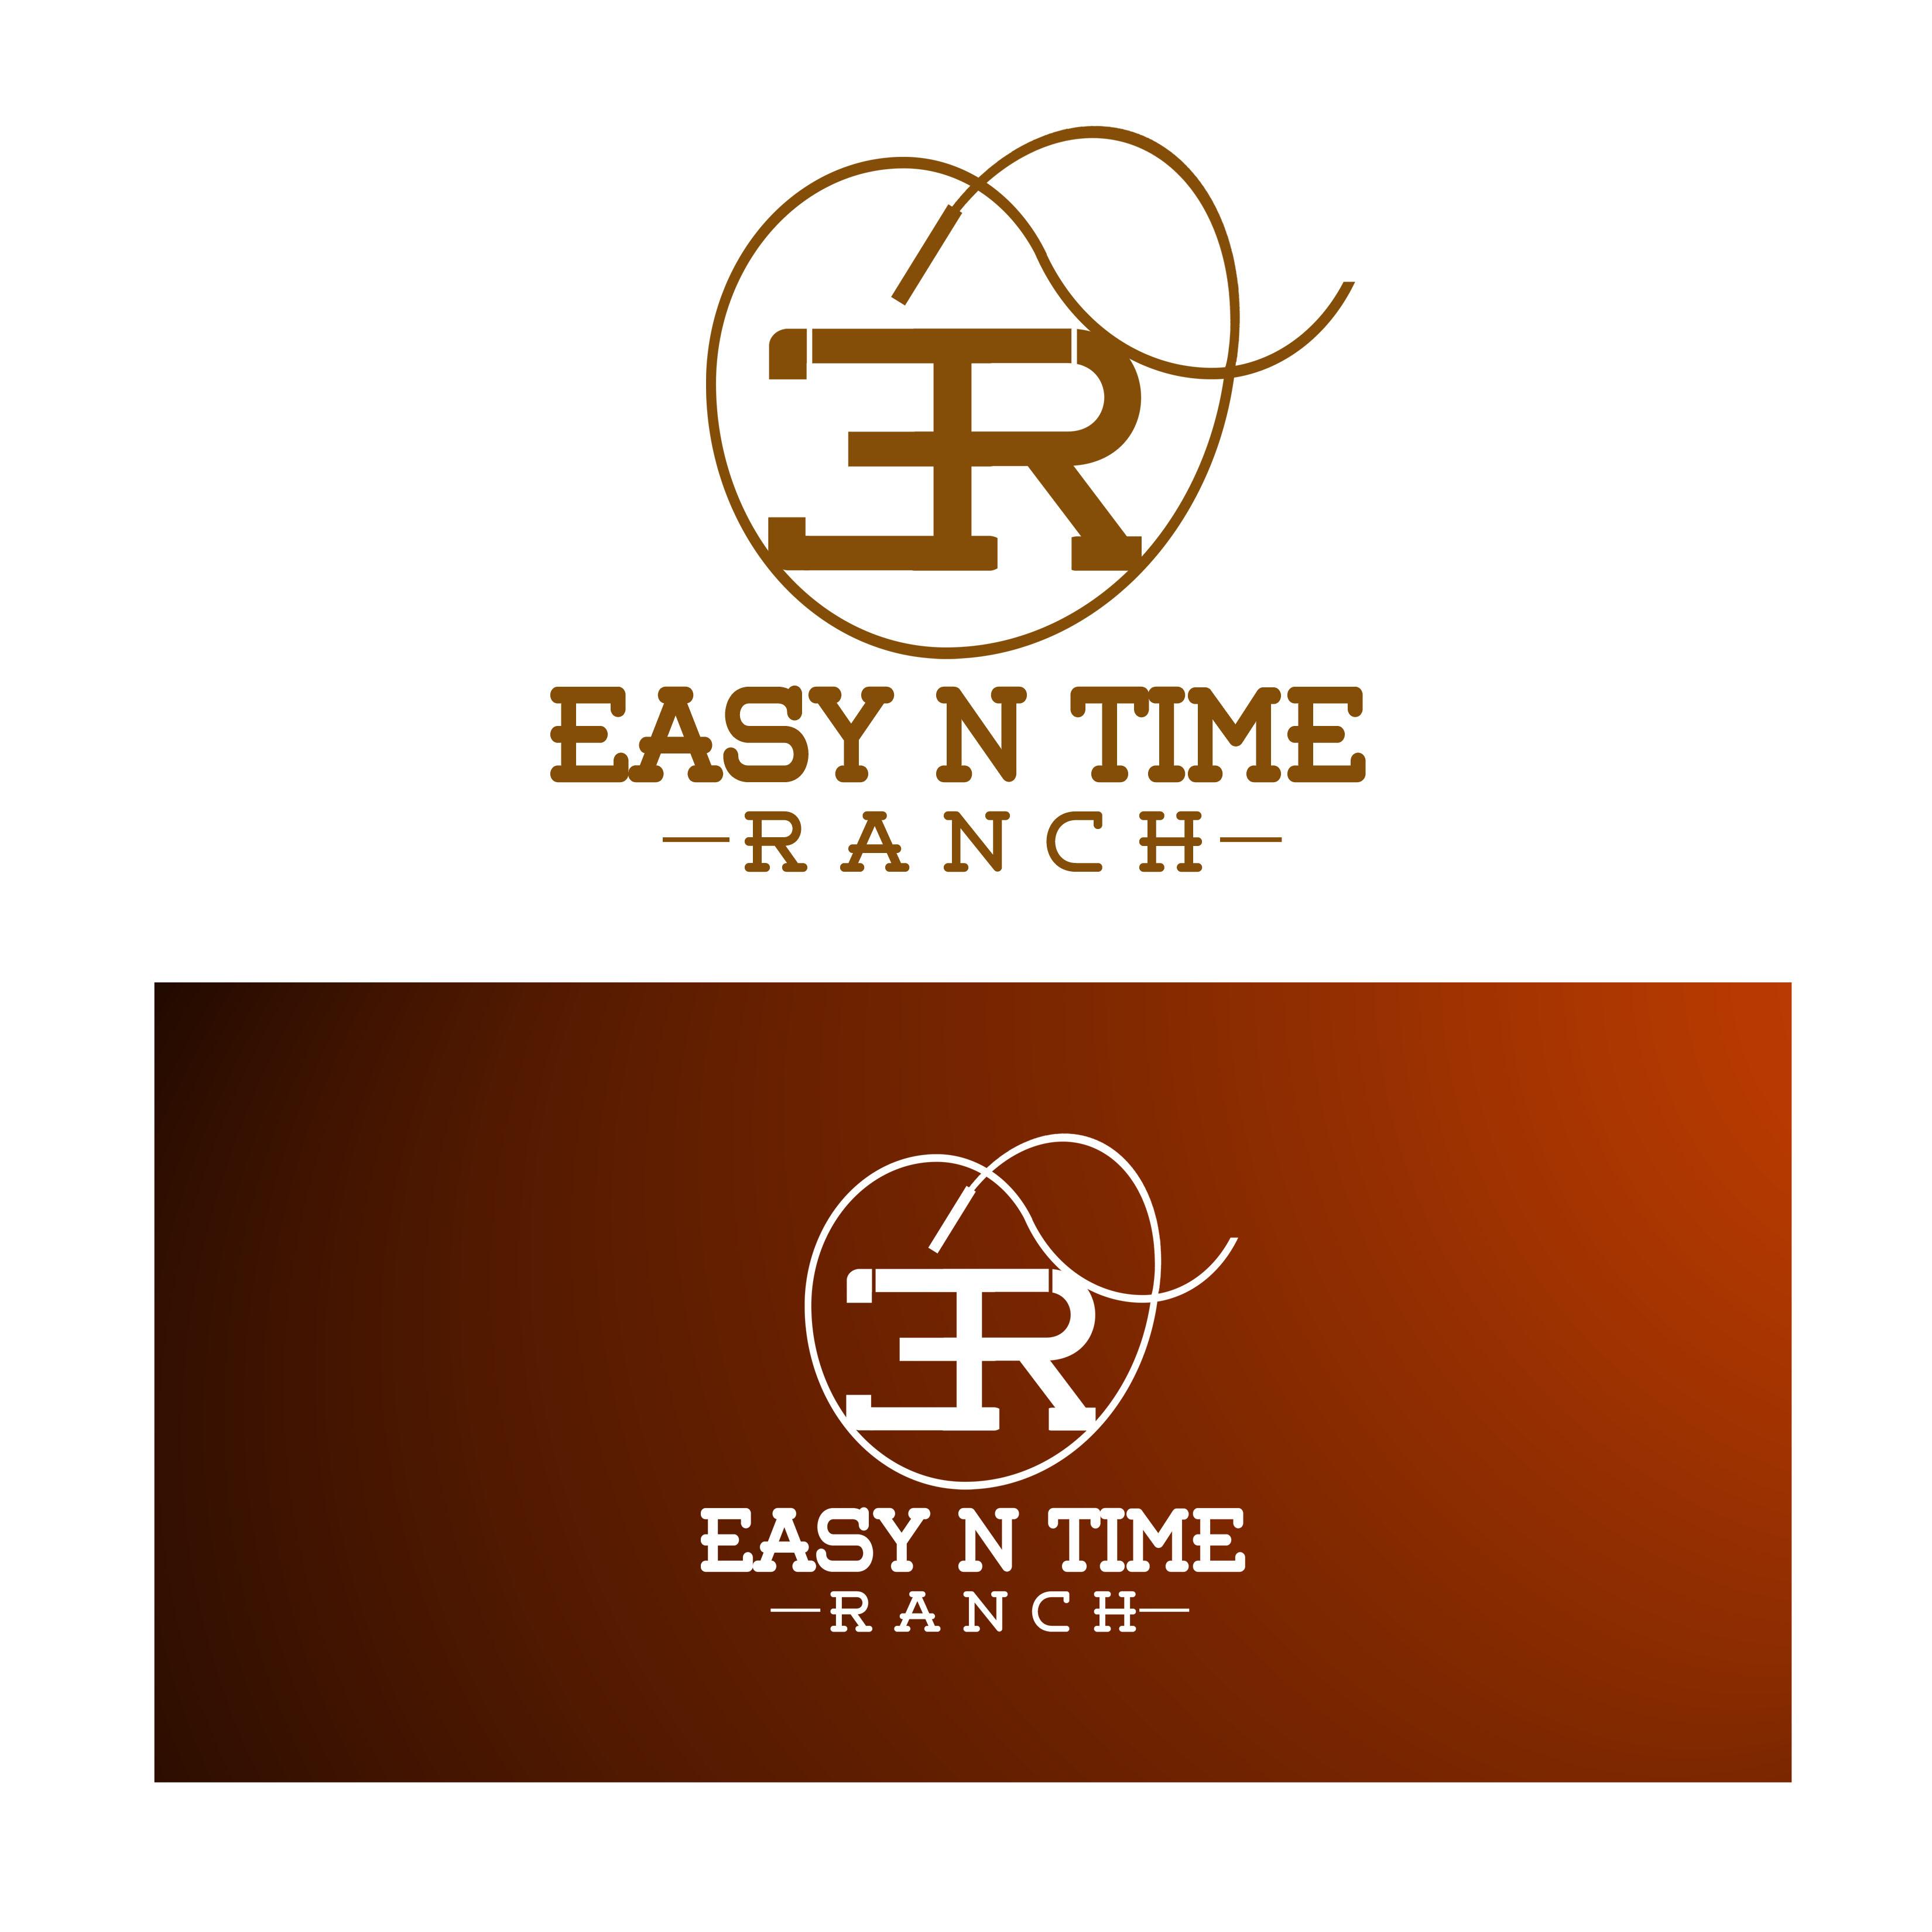 Logo Design by Allan Esclamado - Entry No. 8 in the Logo Design Contest Artistic Logo Design for Easy N Time Ranch.